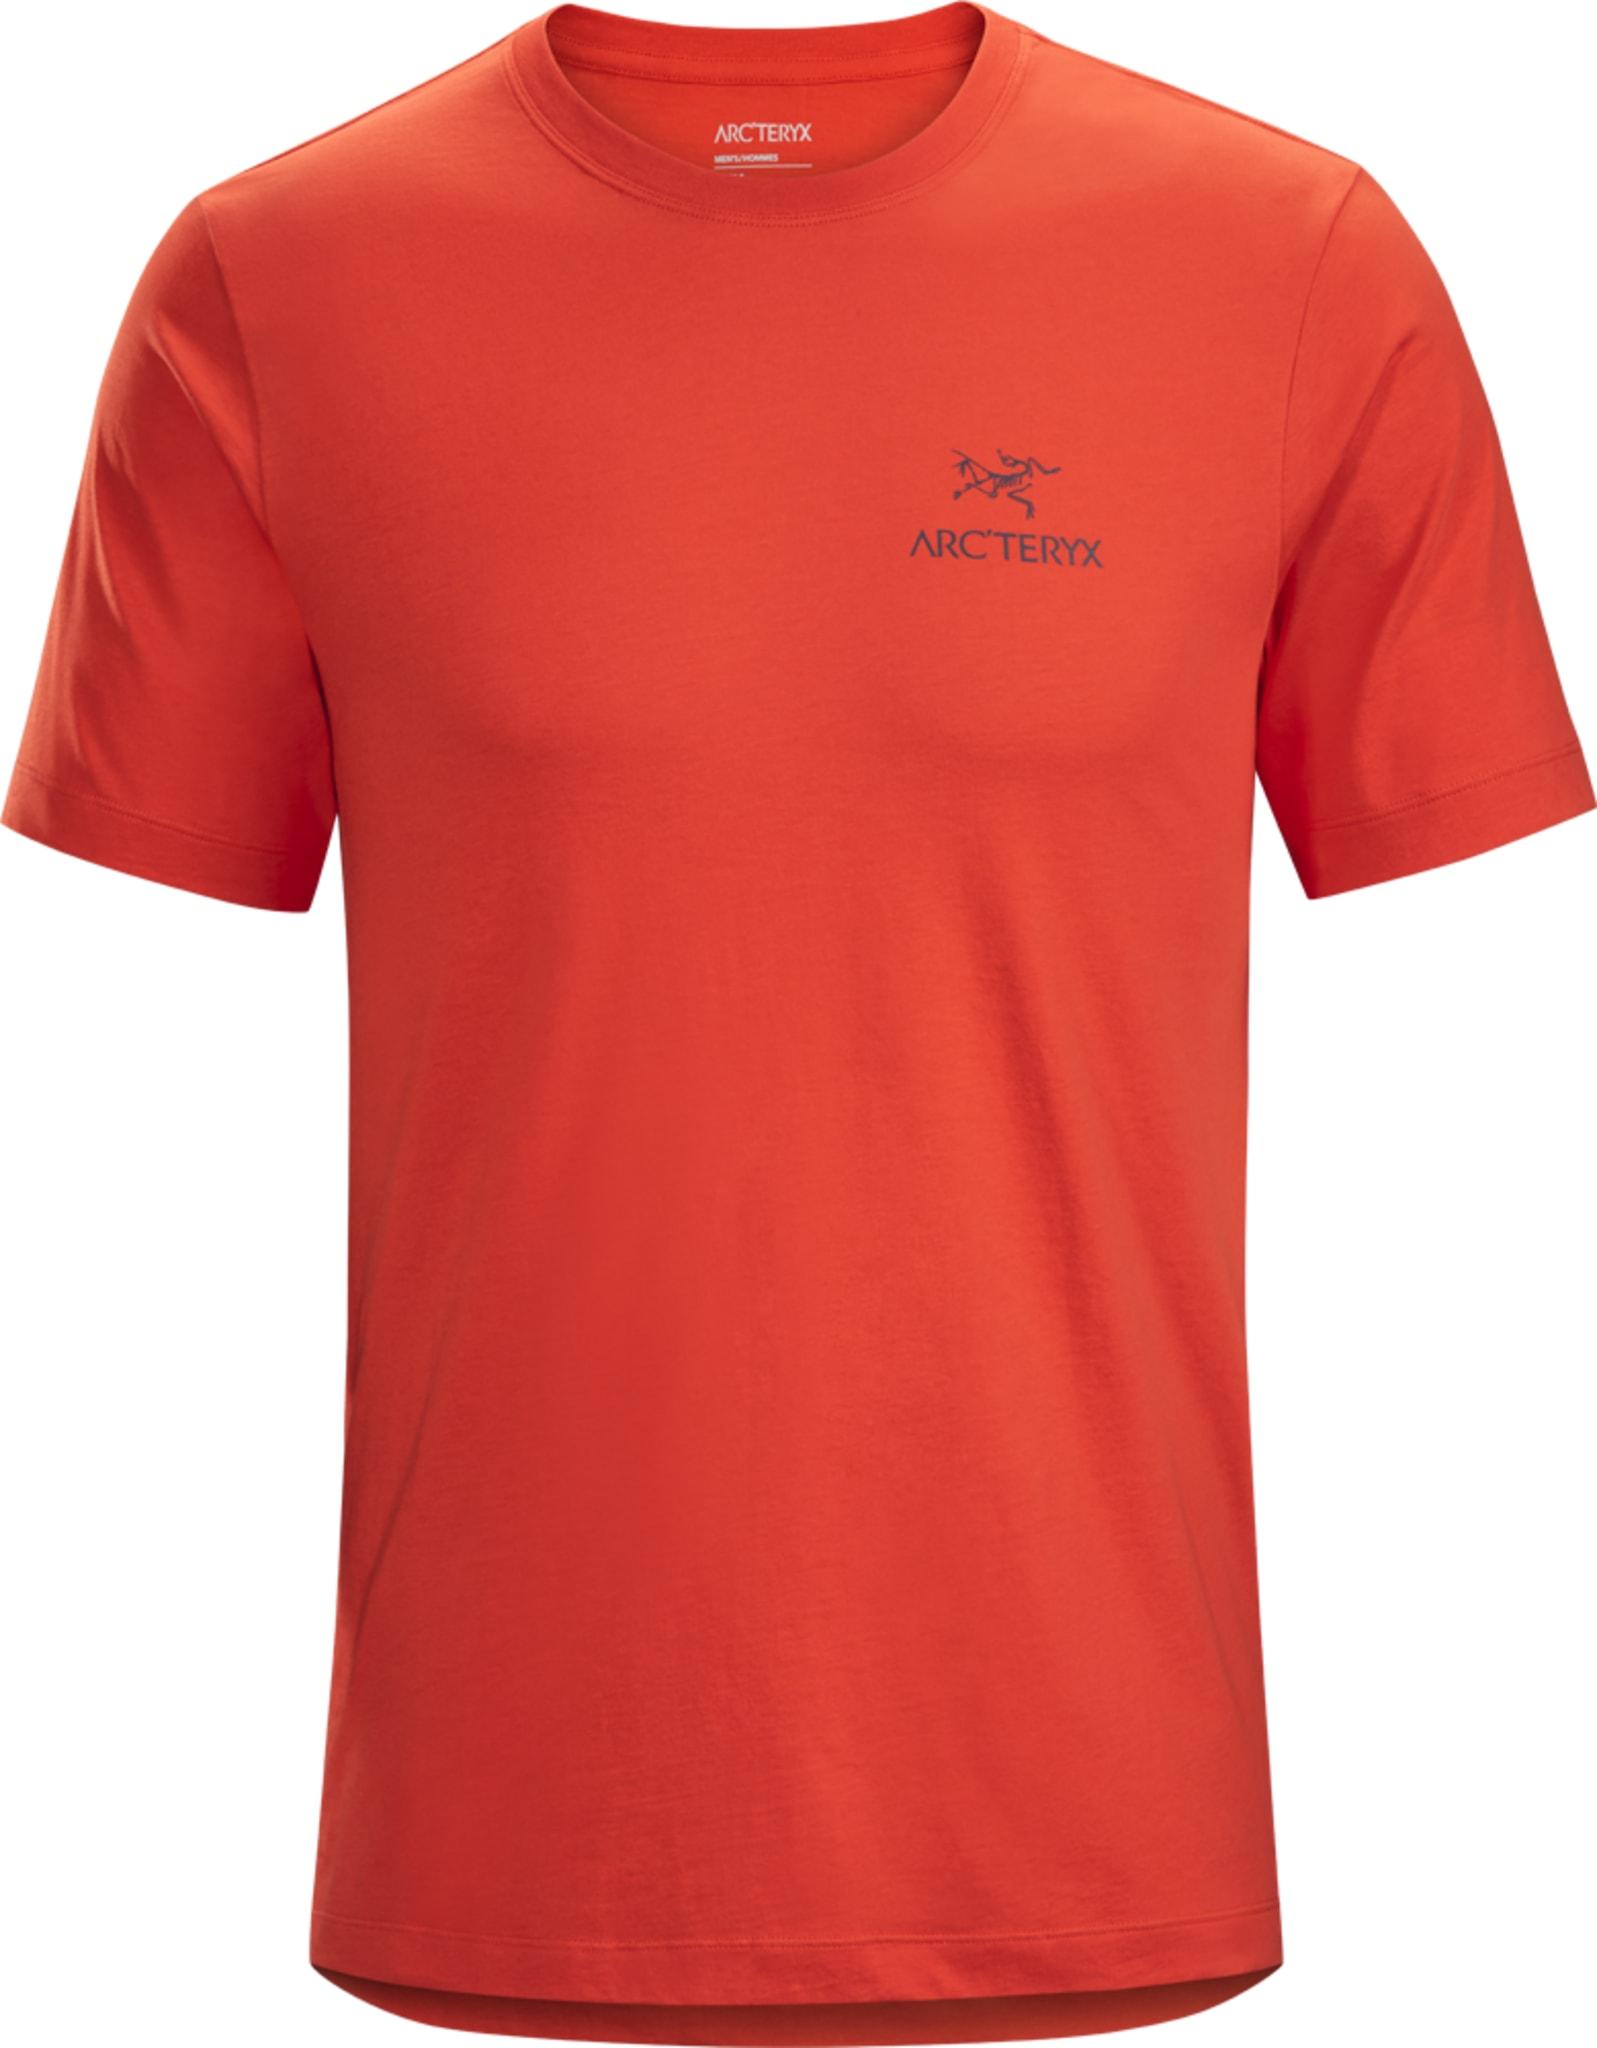 Arcetryx t-shirt med liten logo